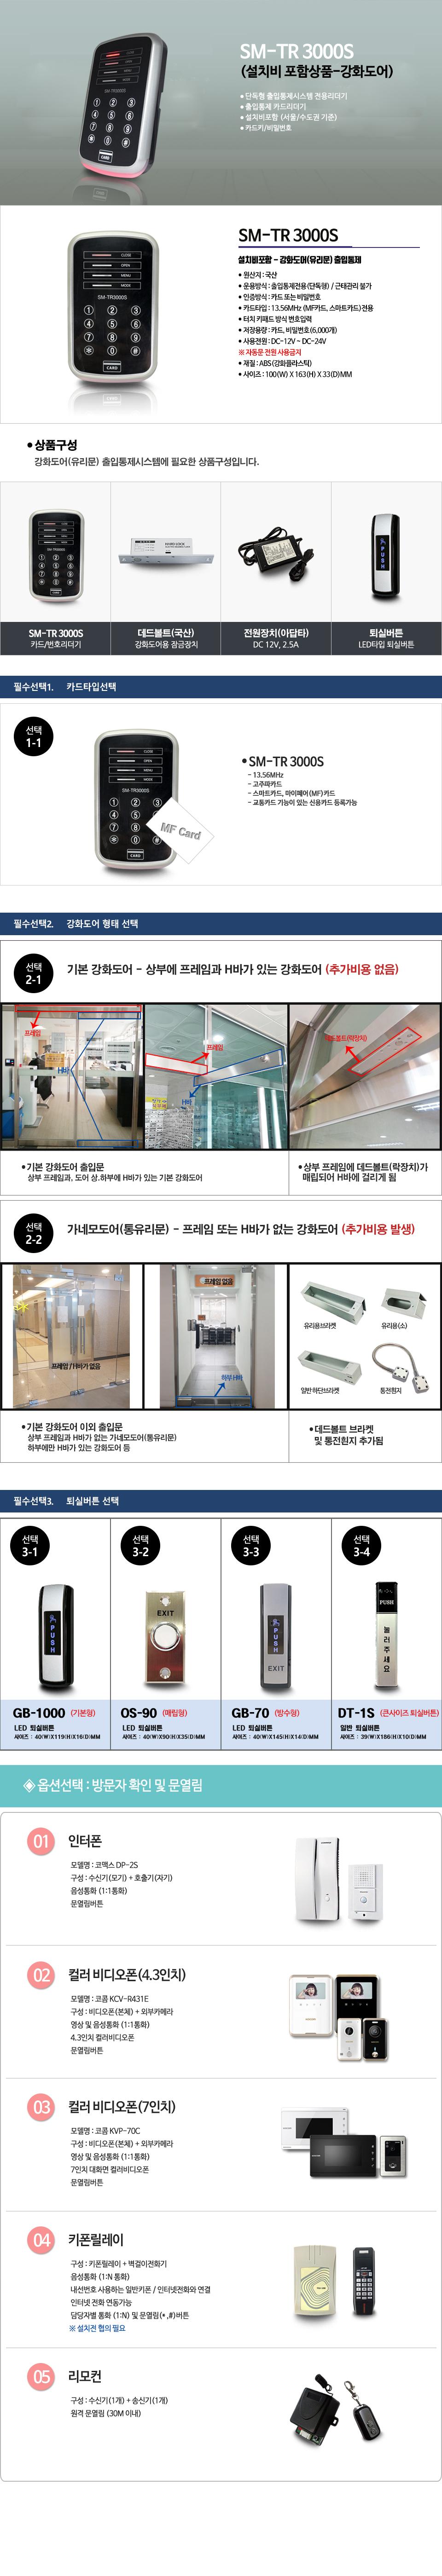 SM-TR3000S설치비포함작업-강화도어.jpg